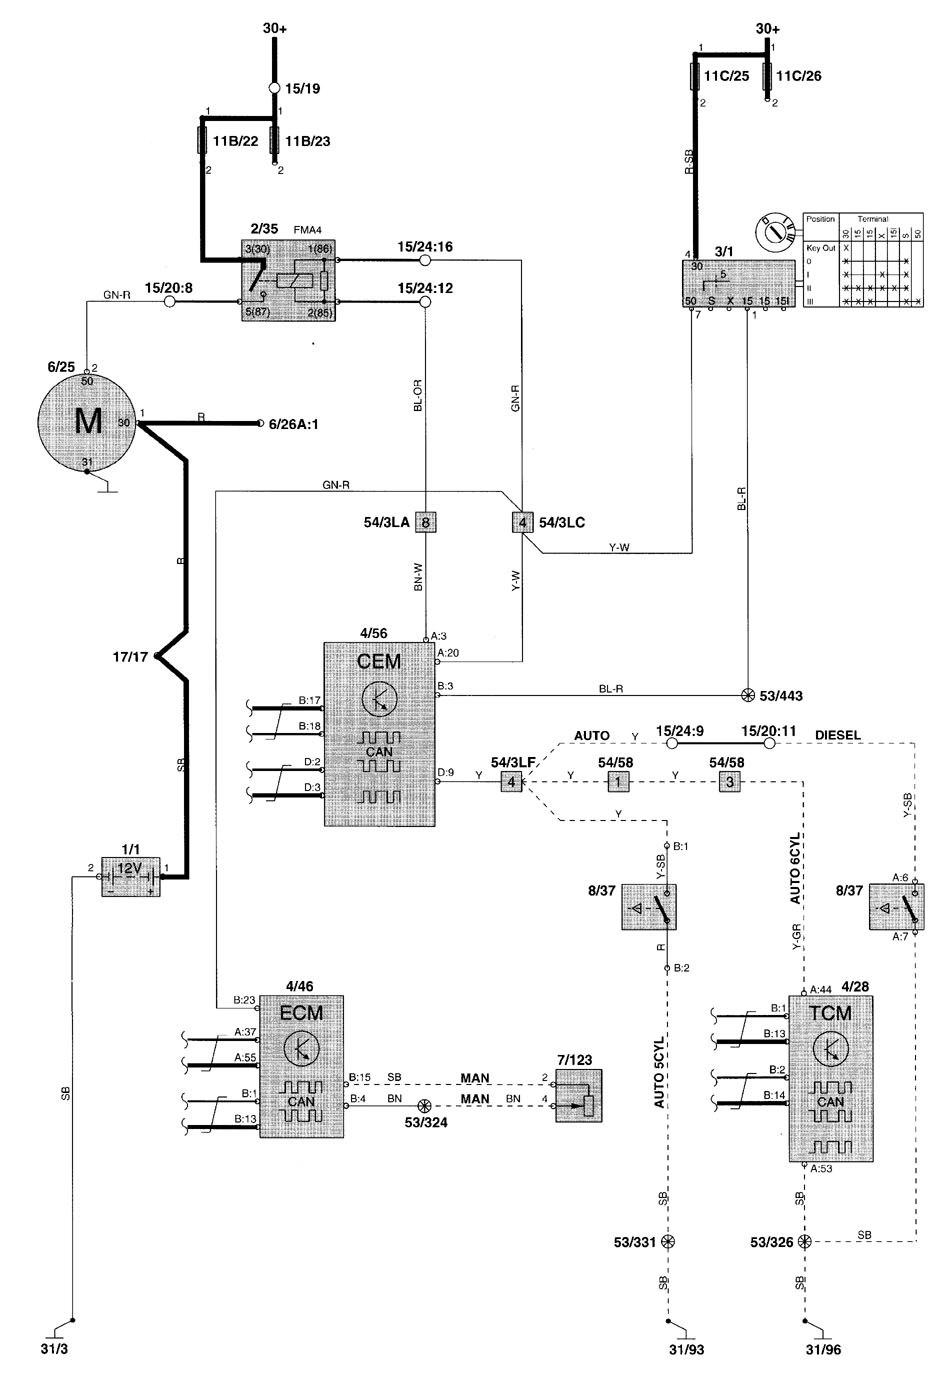 hight resolution of volvo v70 2001 wiring diagrams starting carknowledge volvo v70 engine diagram 2001 volvo v70 wiring diagram pdf